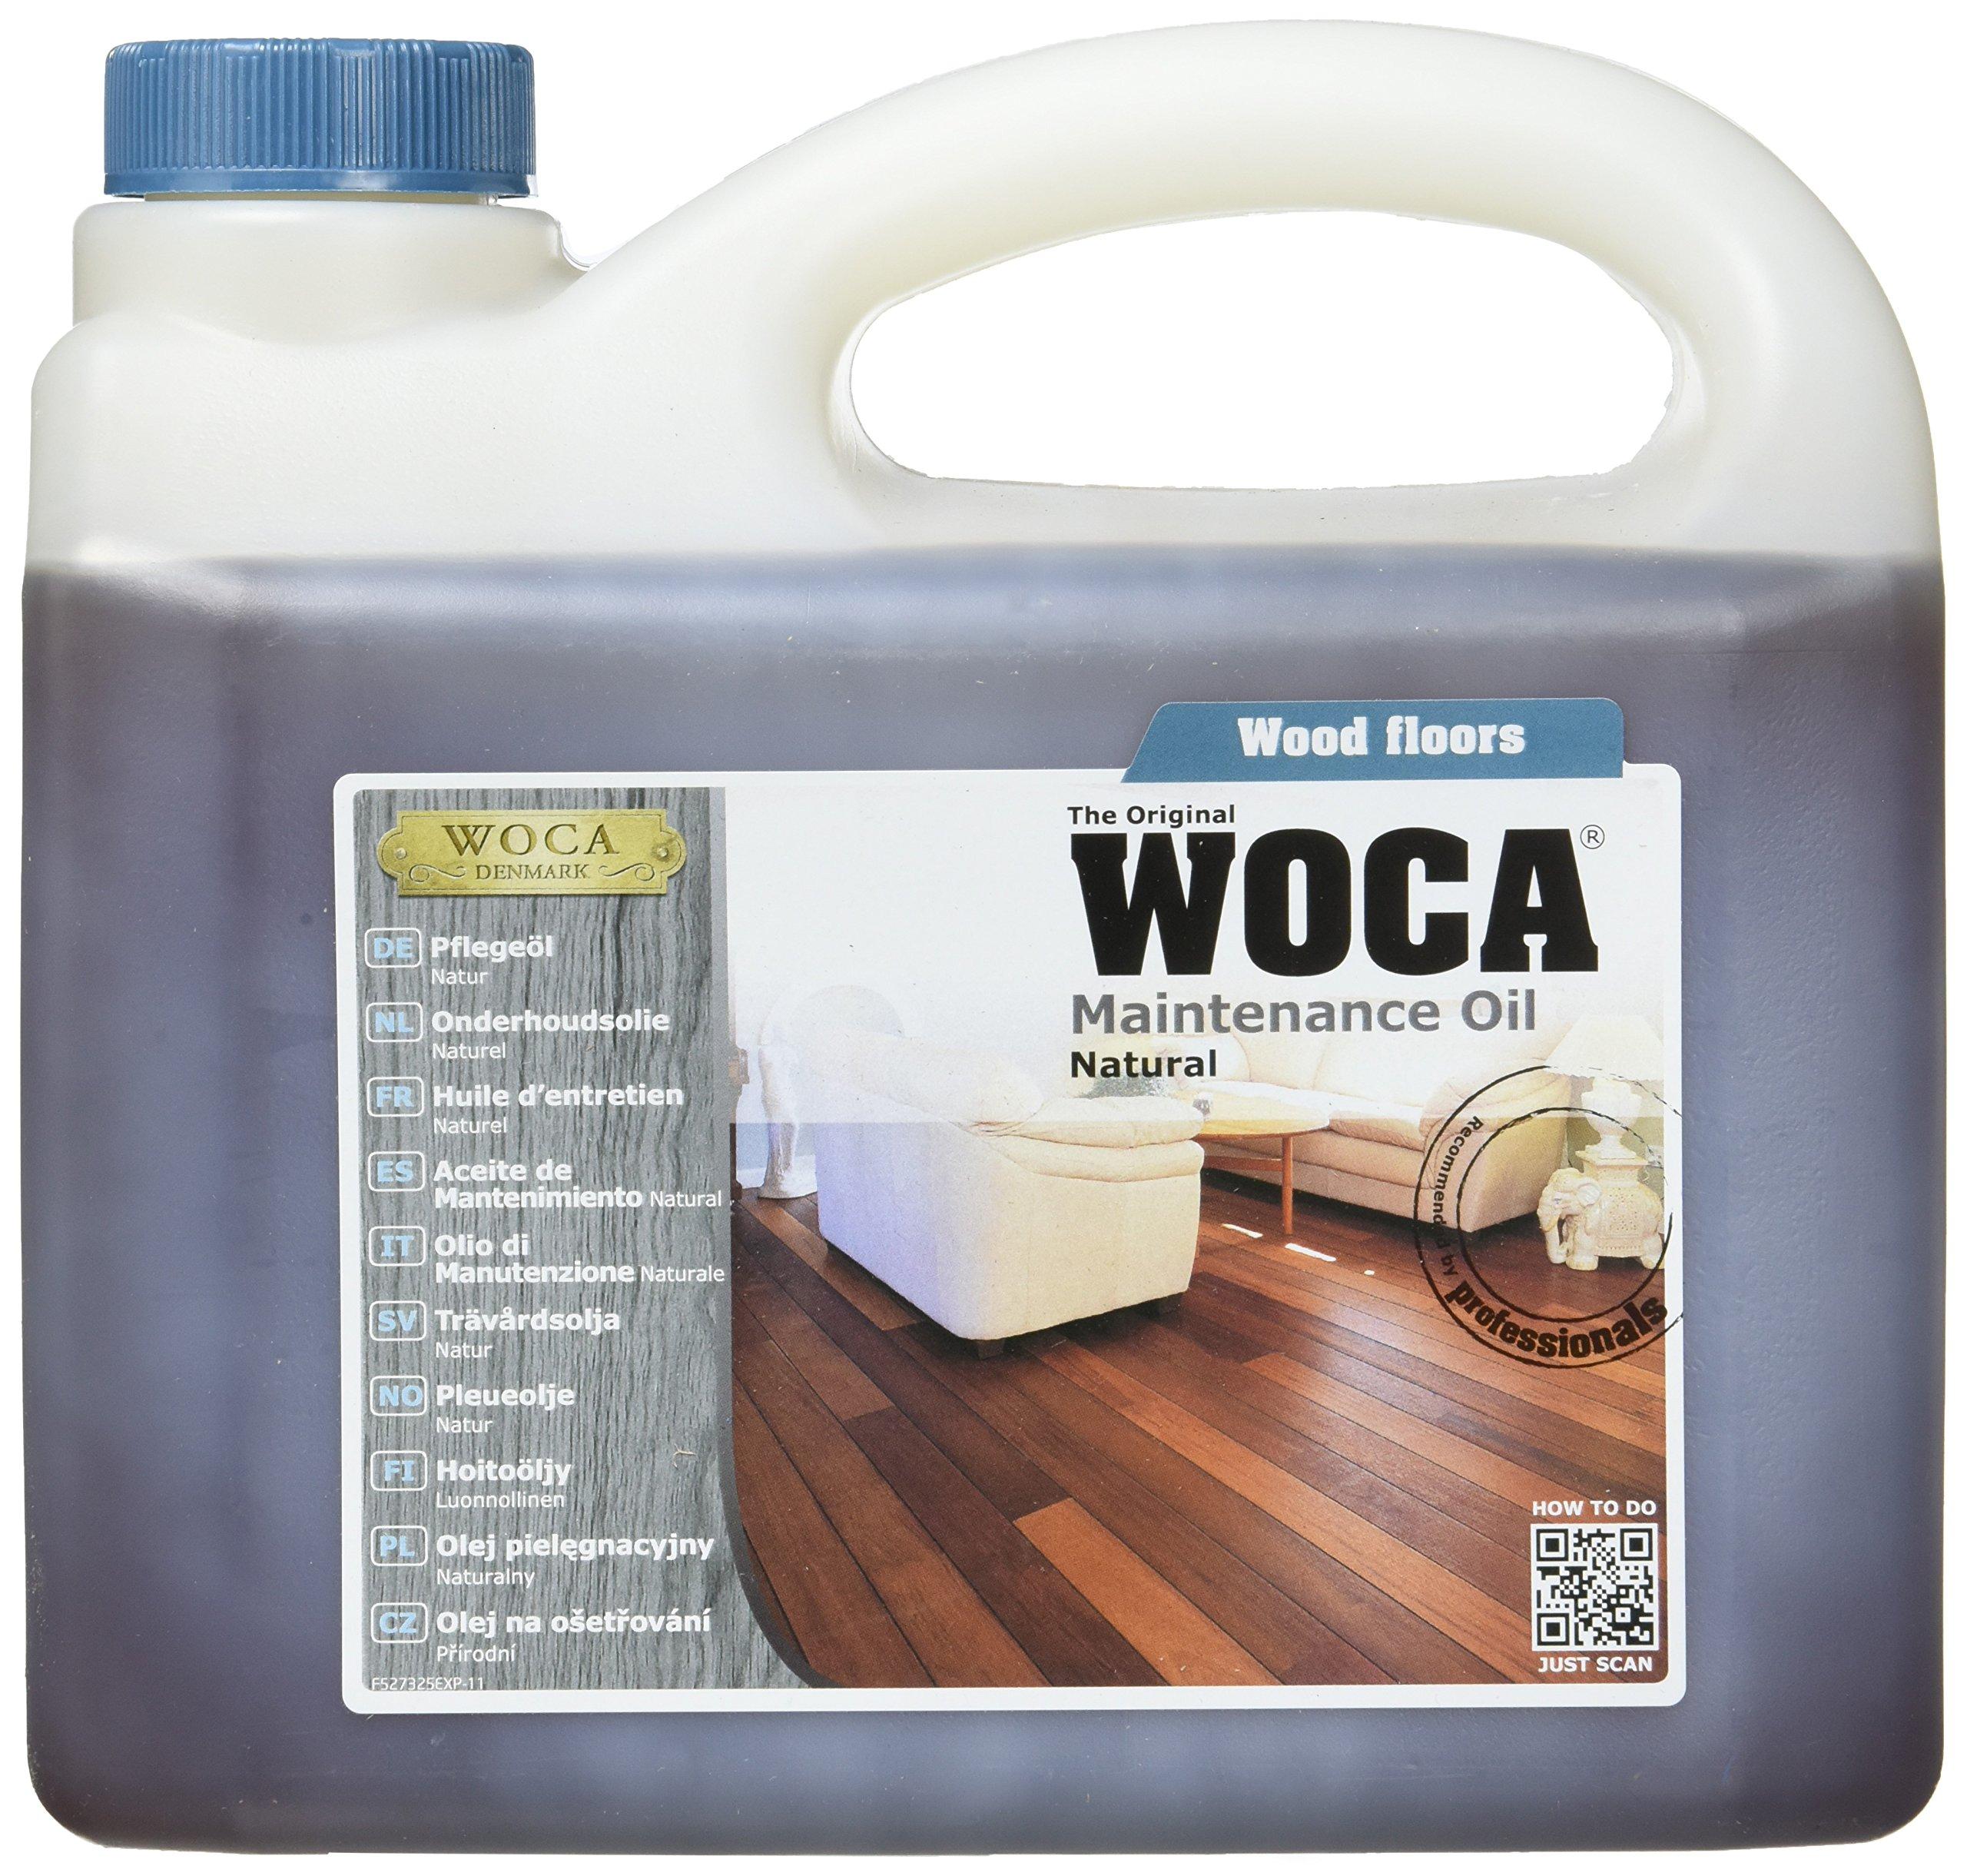 Woca Maintenance Oil - Natural (2.5 liter)